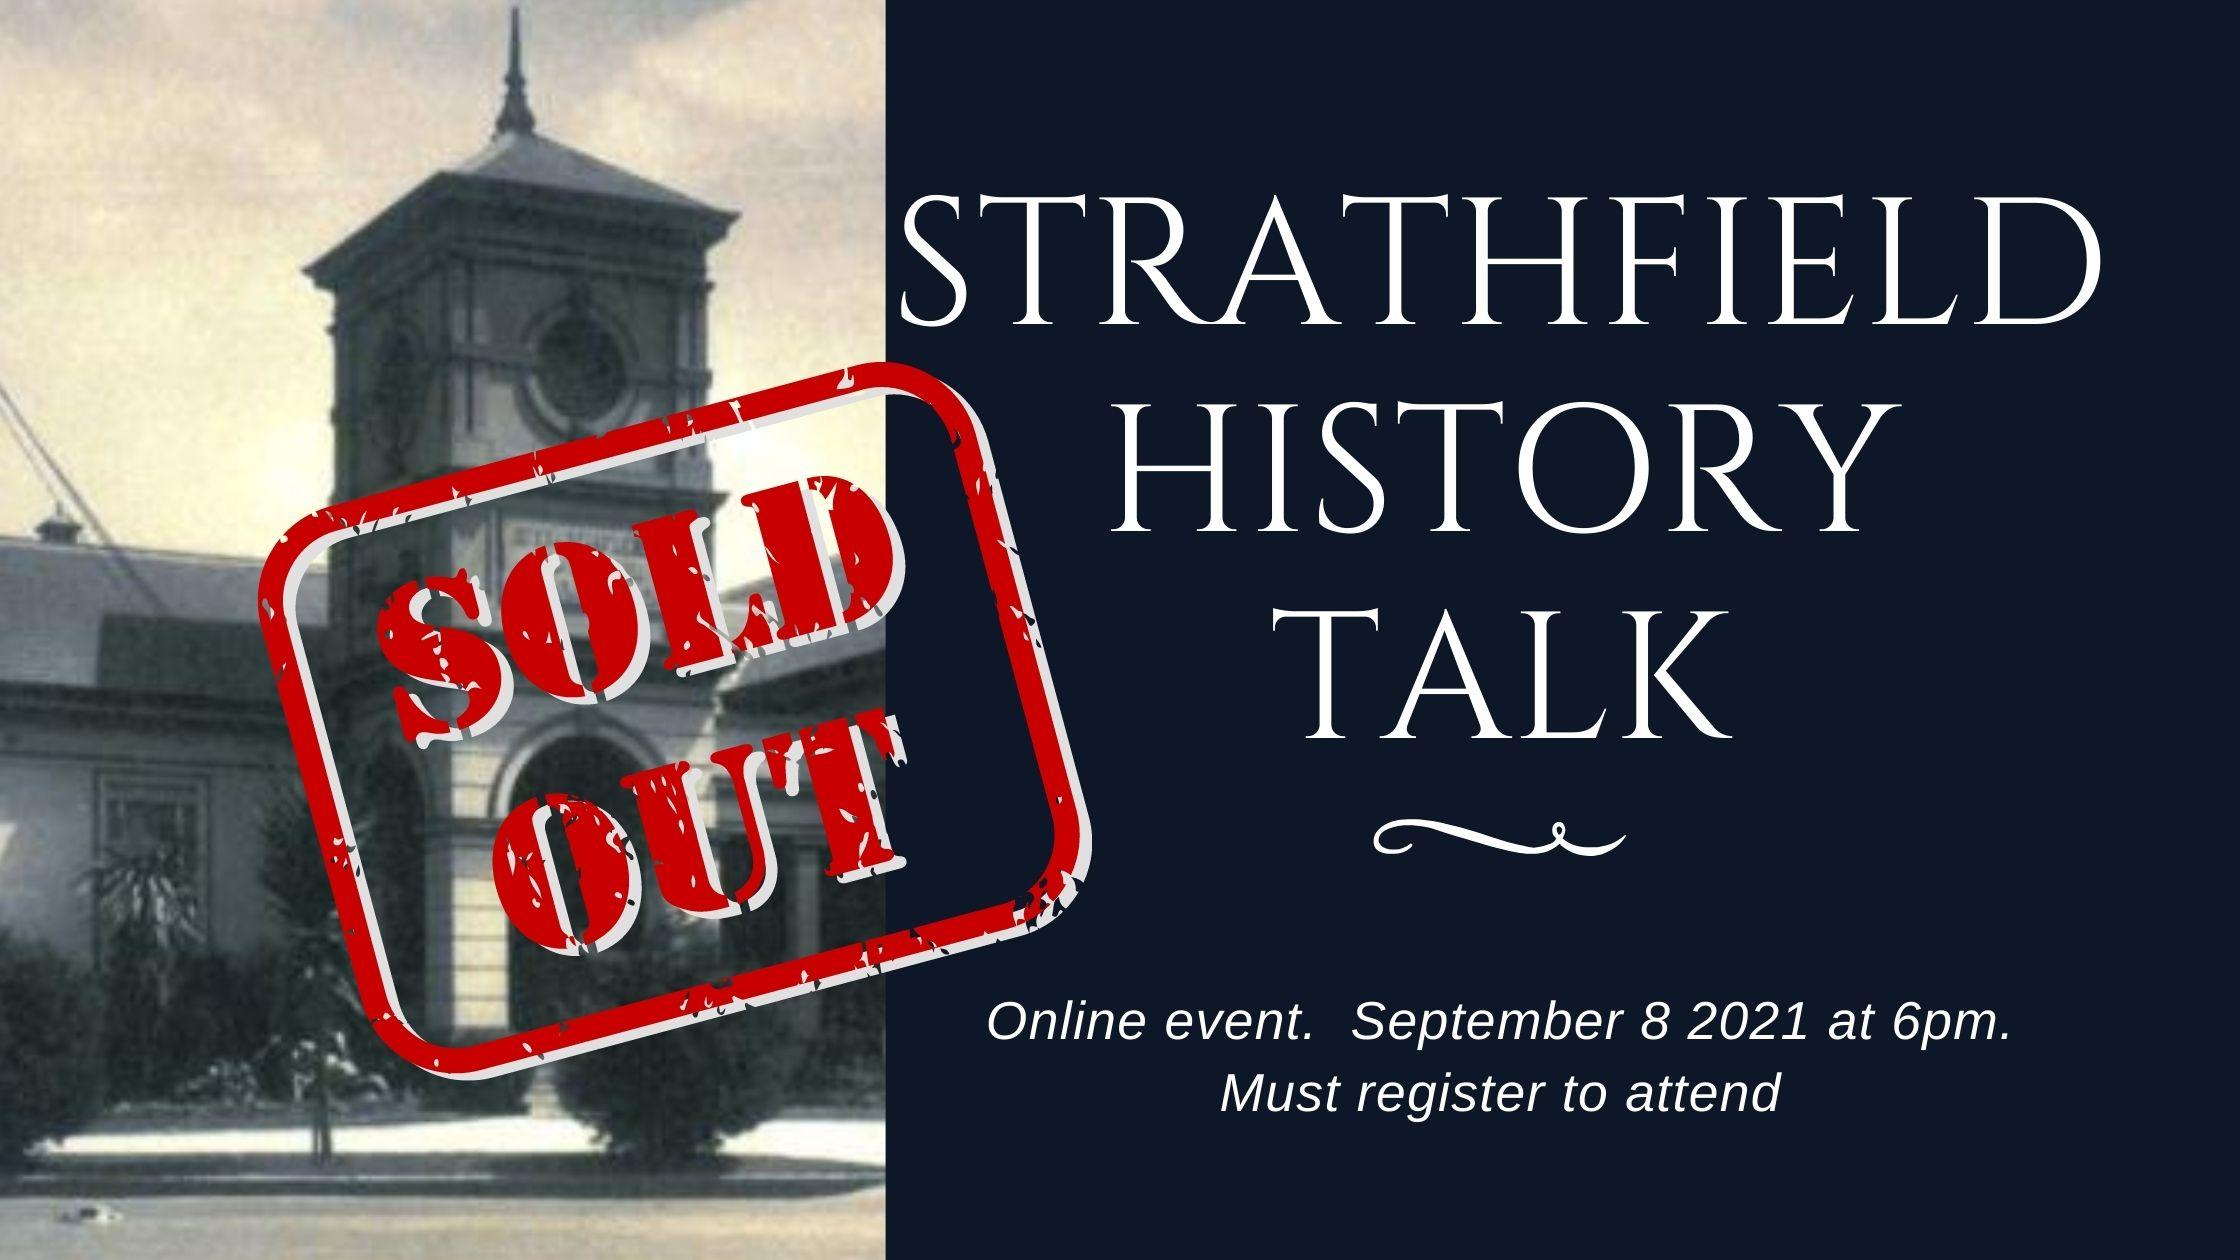 Online Talk on Strathfield History & Q&A